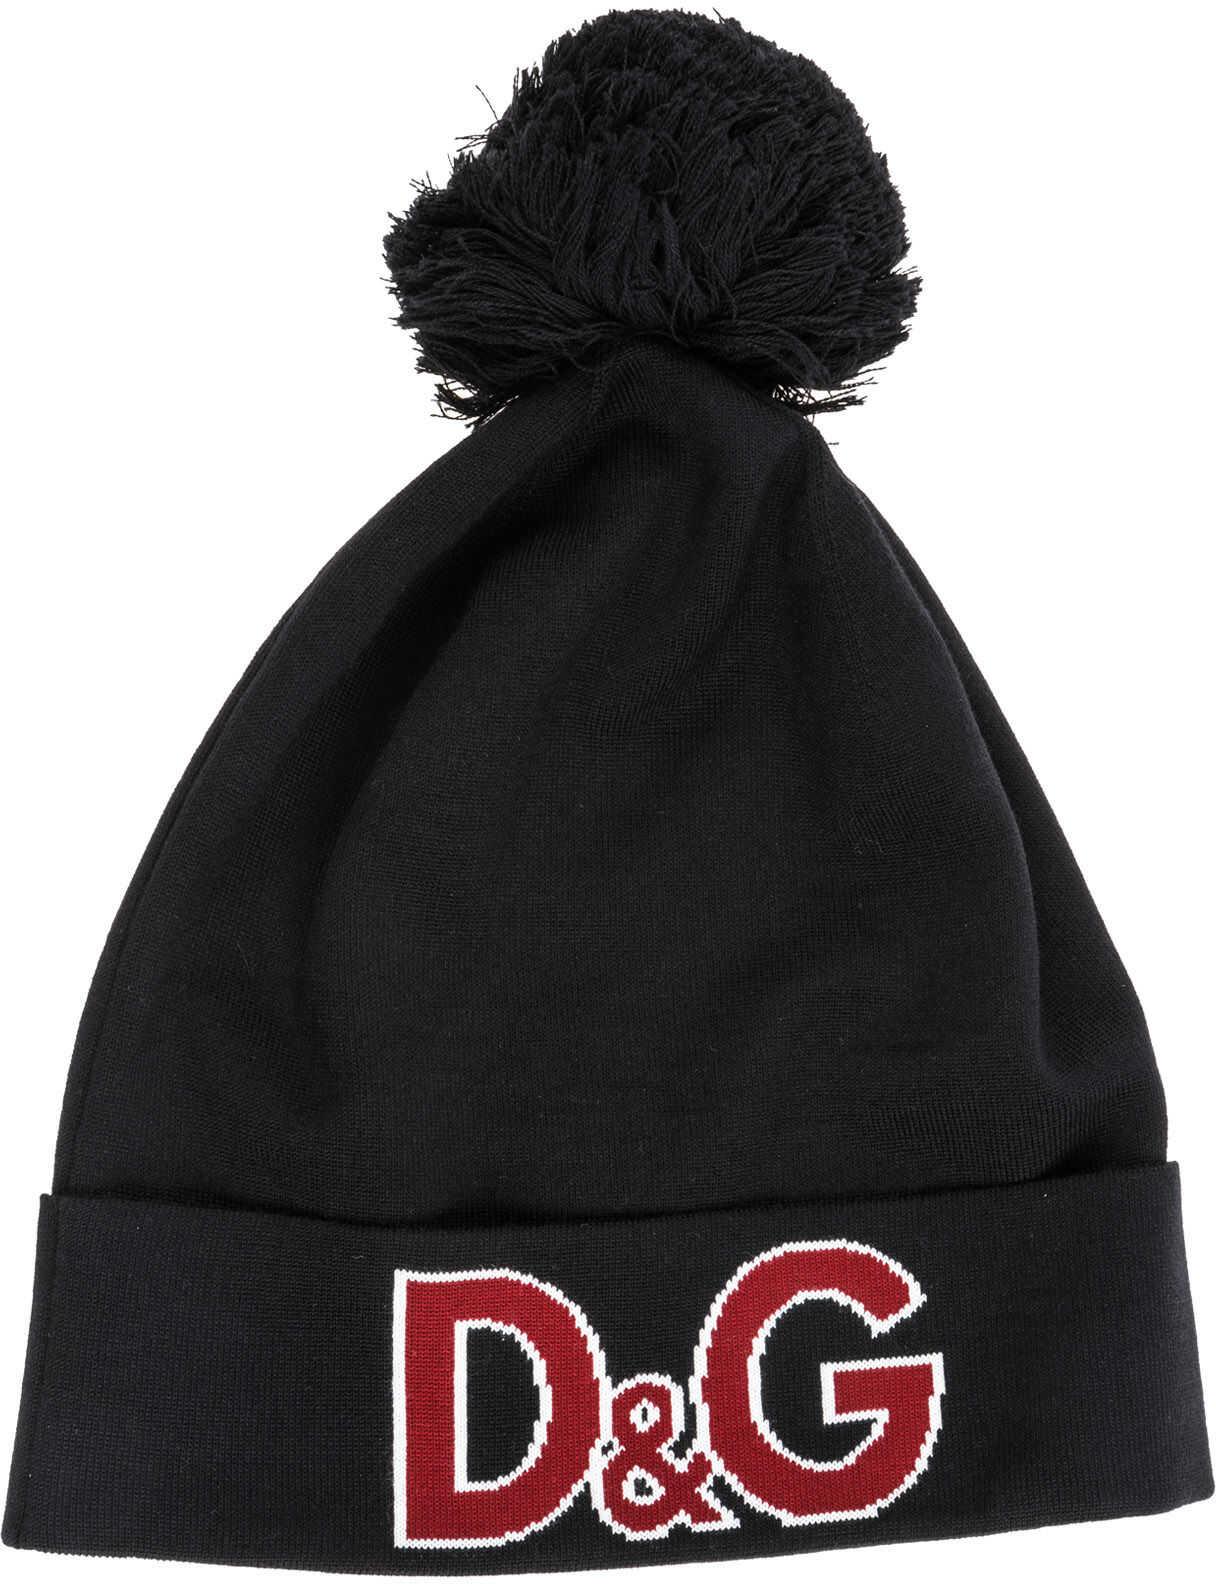 Dolce & Gabbana Beanie Hat Black